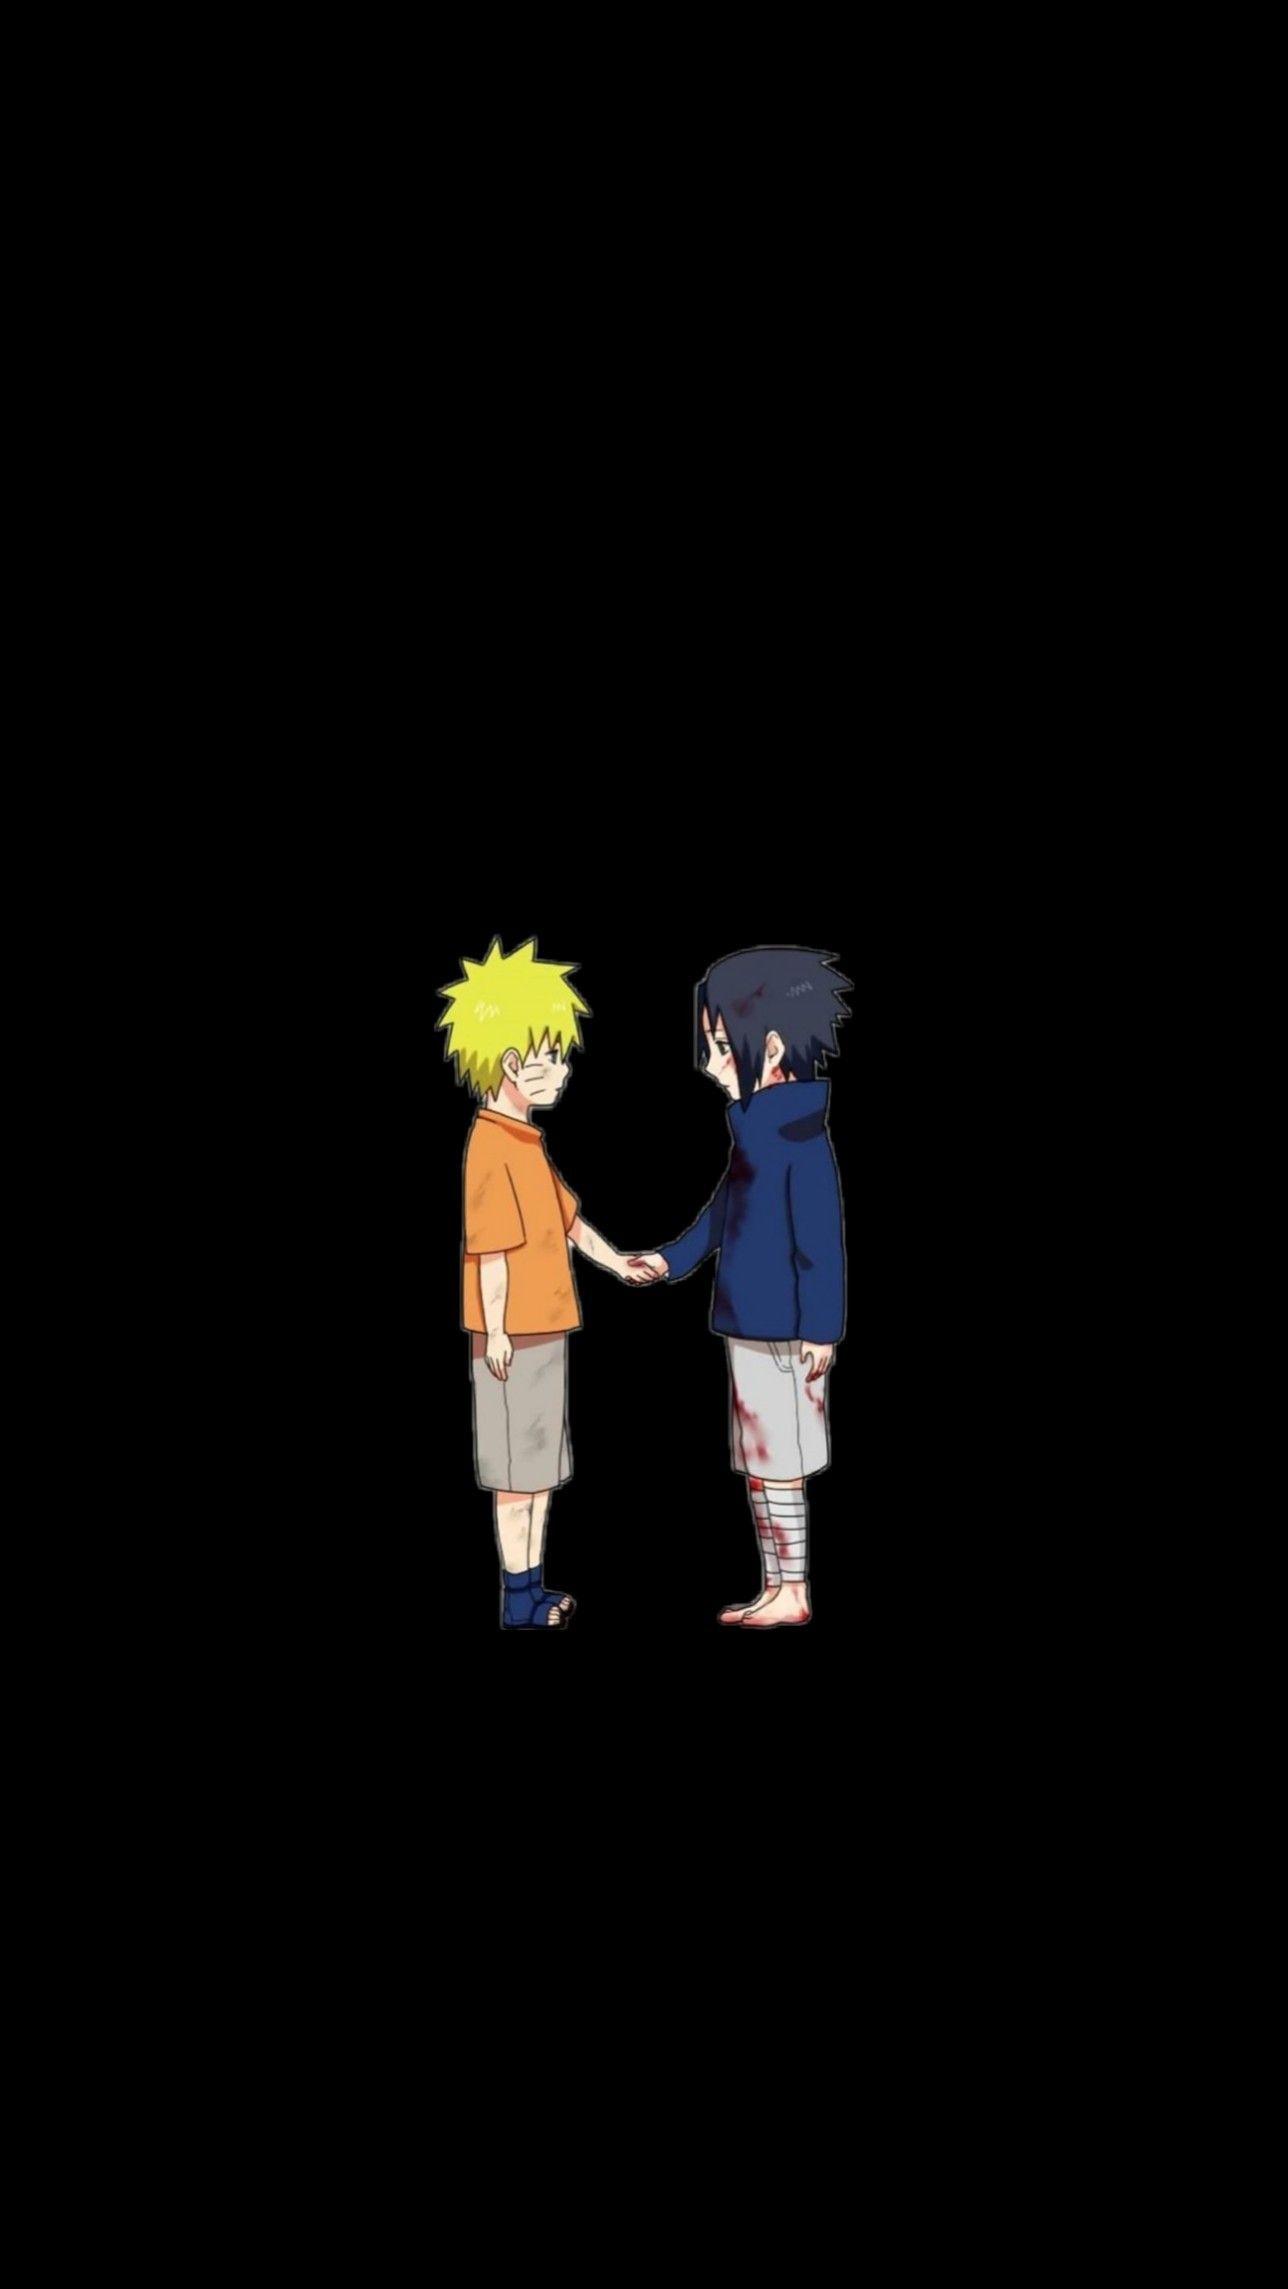 Naruto And Sasuke In 2020 Anime Lock Screen Wallpapers Iphone Wallpaper Vintage Anime Lock Screen